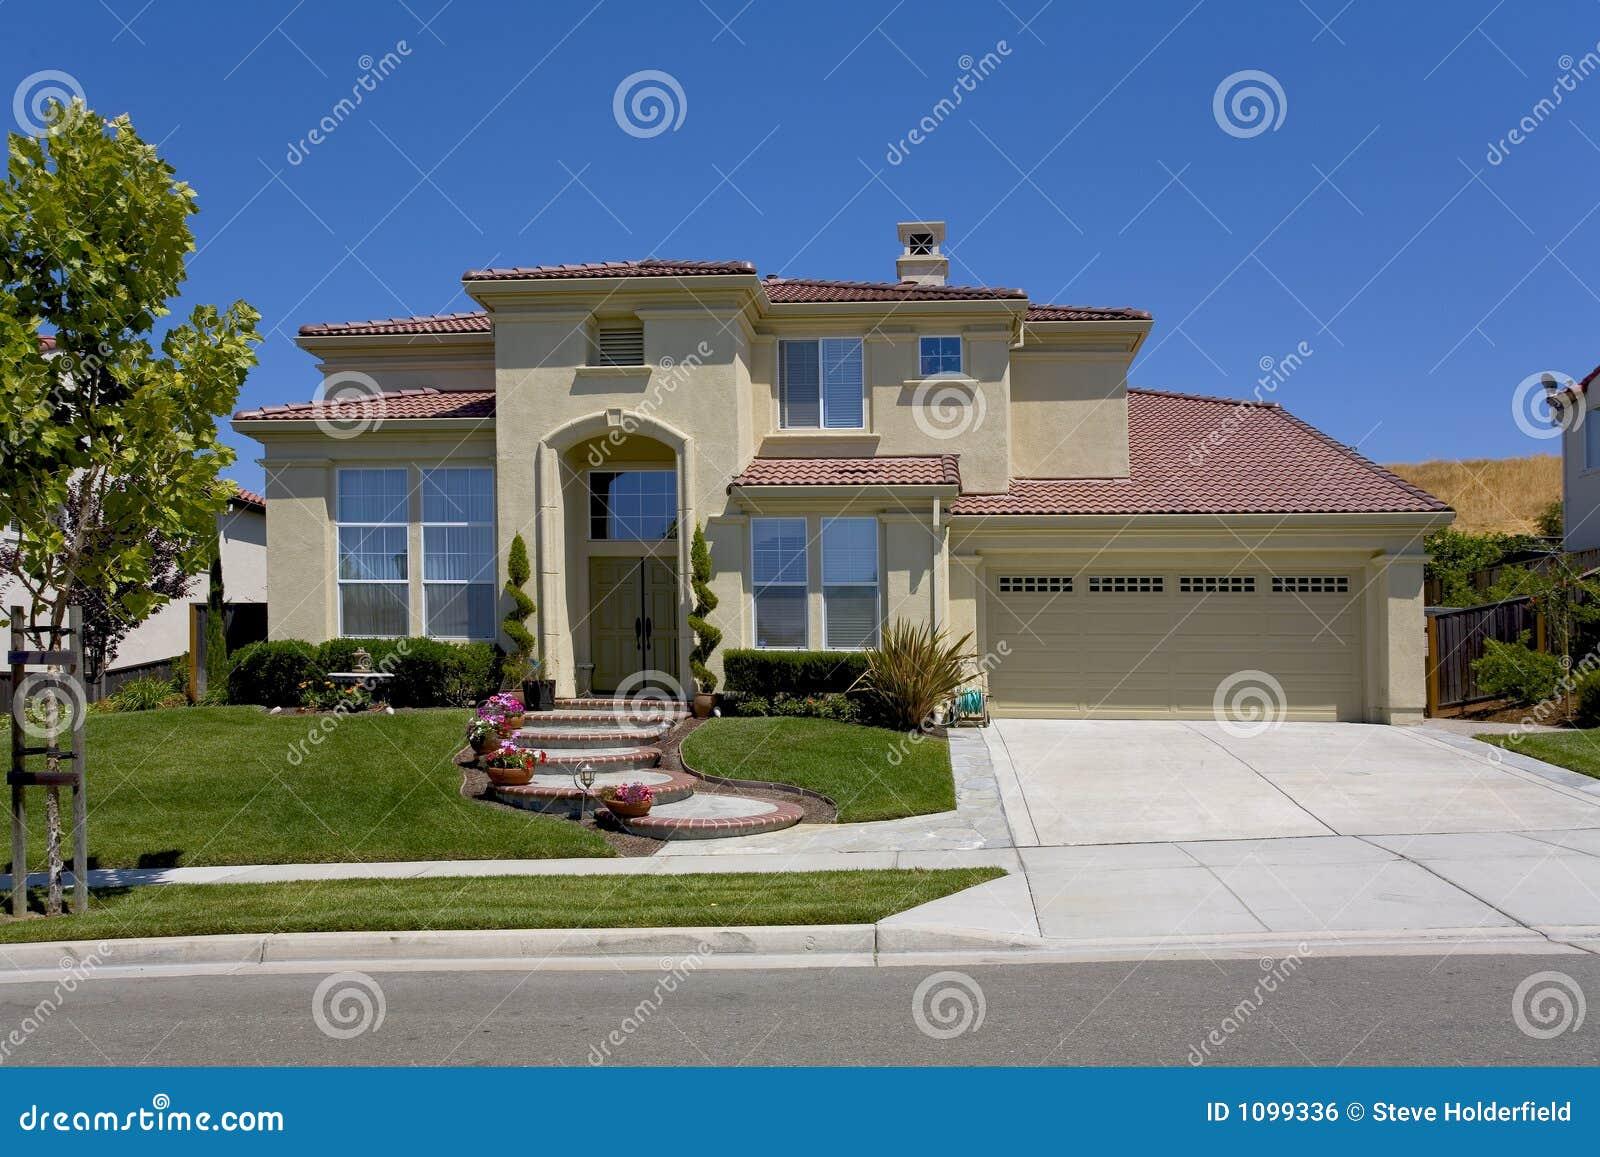 Pi nuova casa a due piani spagnola immagine stock libera for Casa a due piani